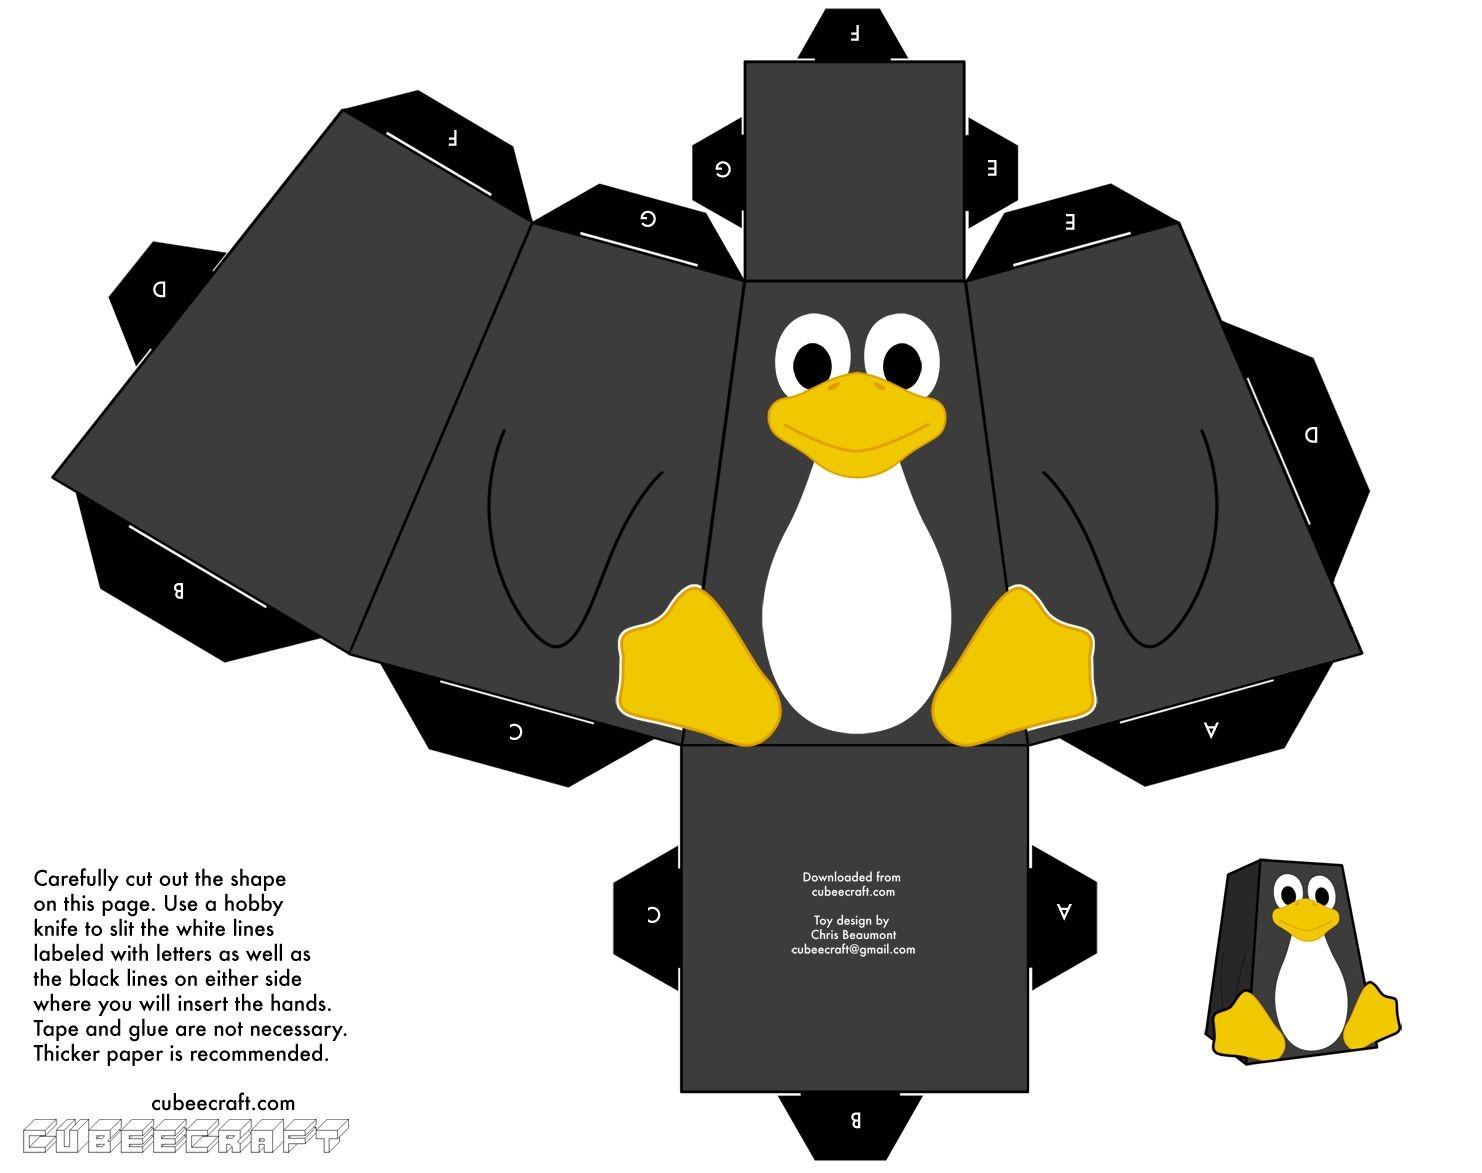 Penguin Papercraft Papercraft Y Cubeecraft Para Armar Paper Figurines